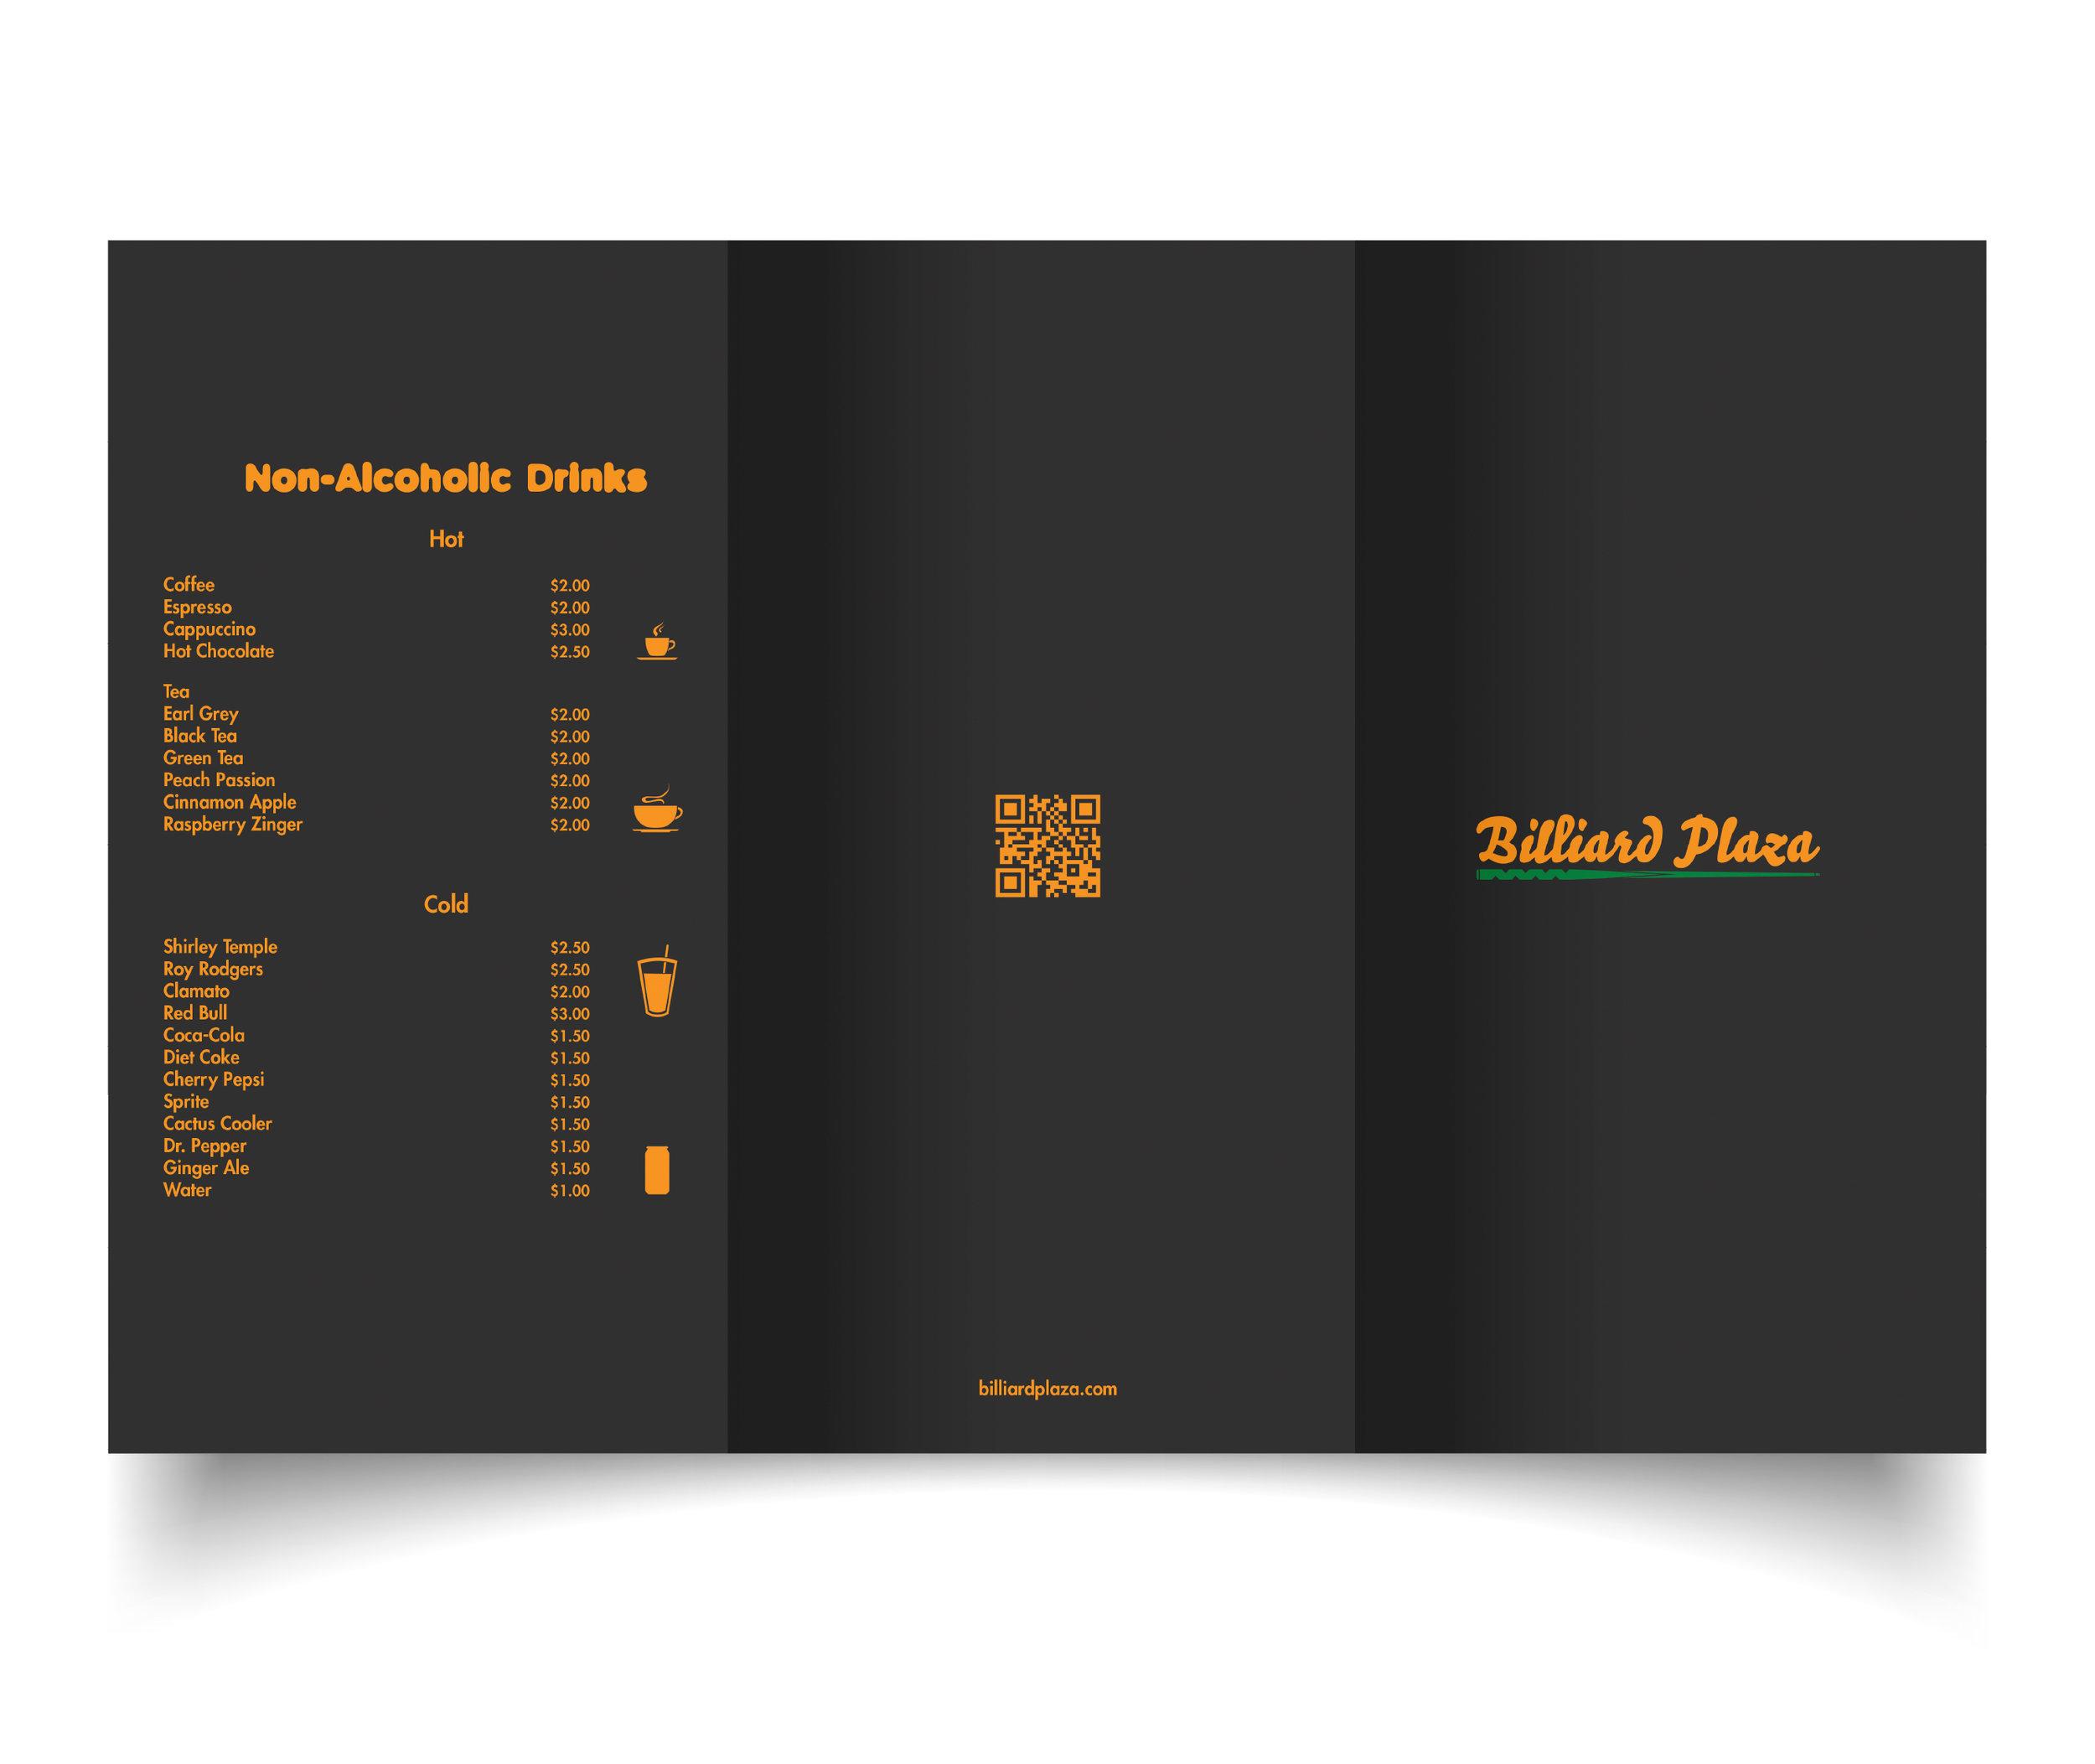 billiards-plaza-menu-1.jpg